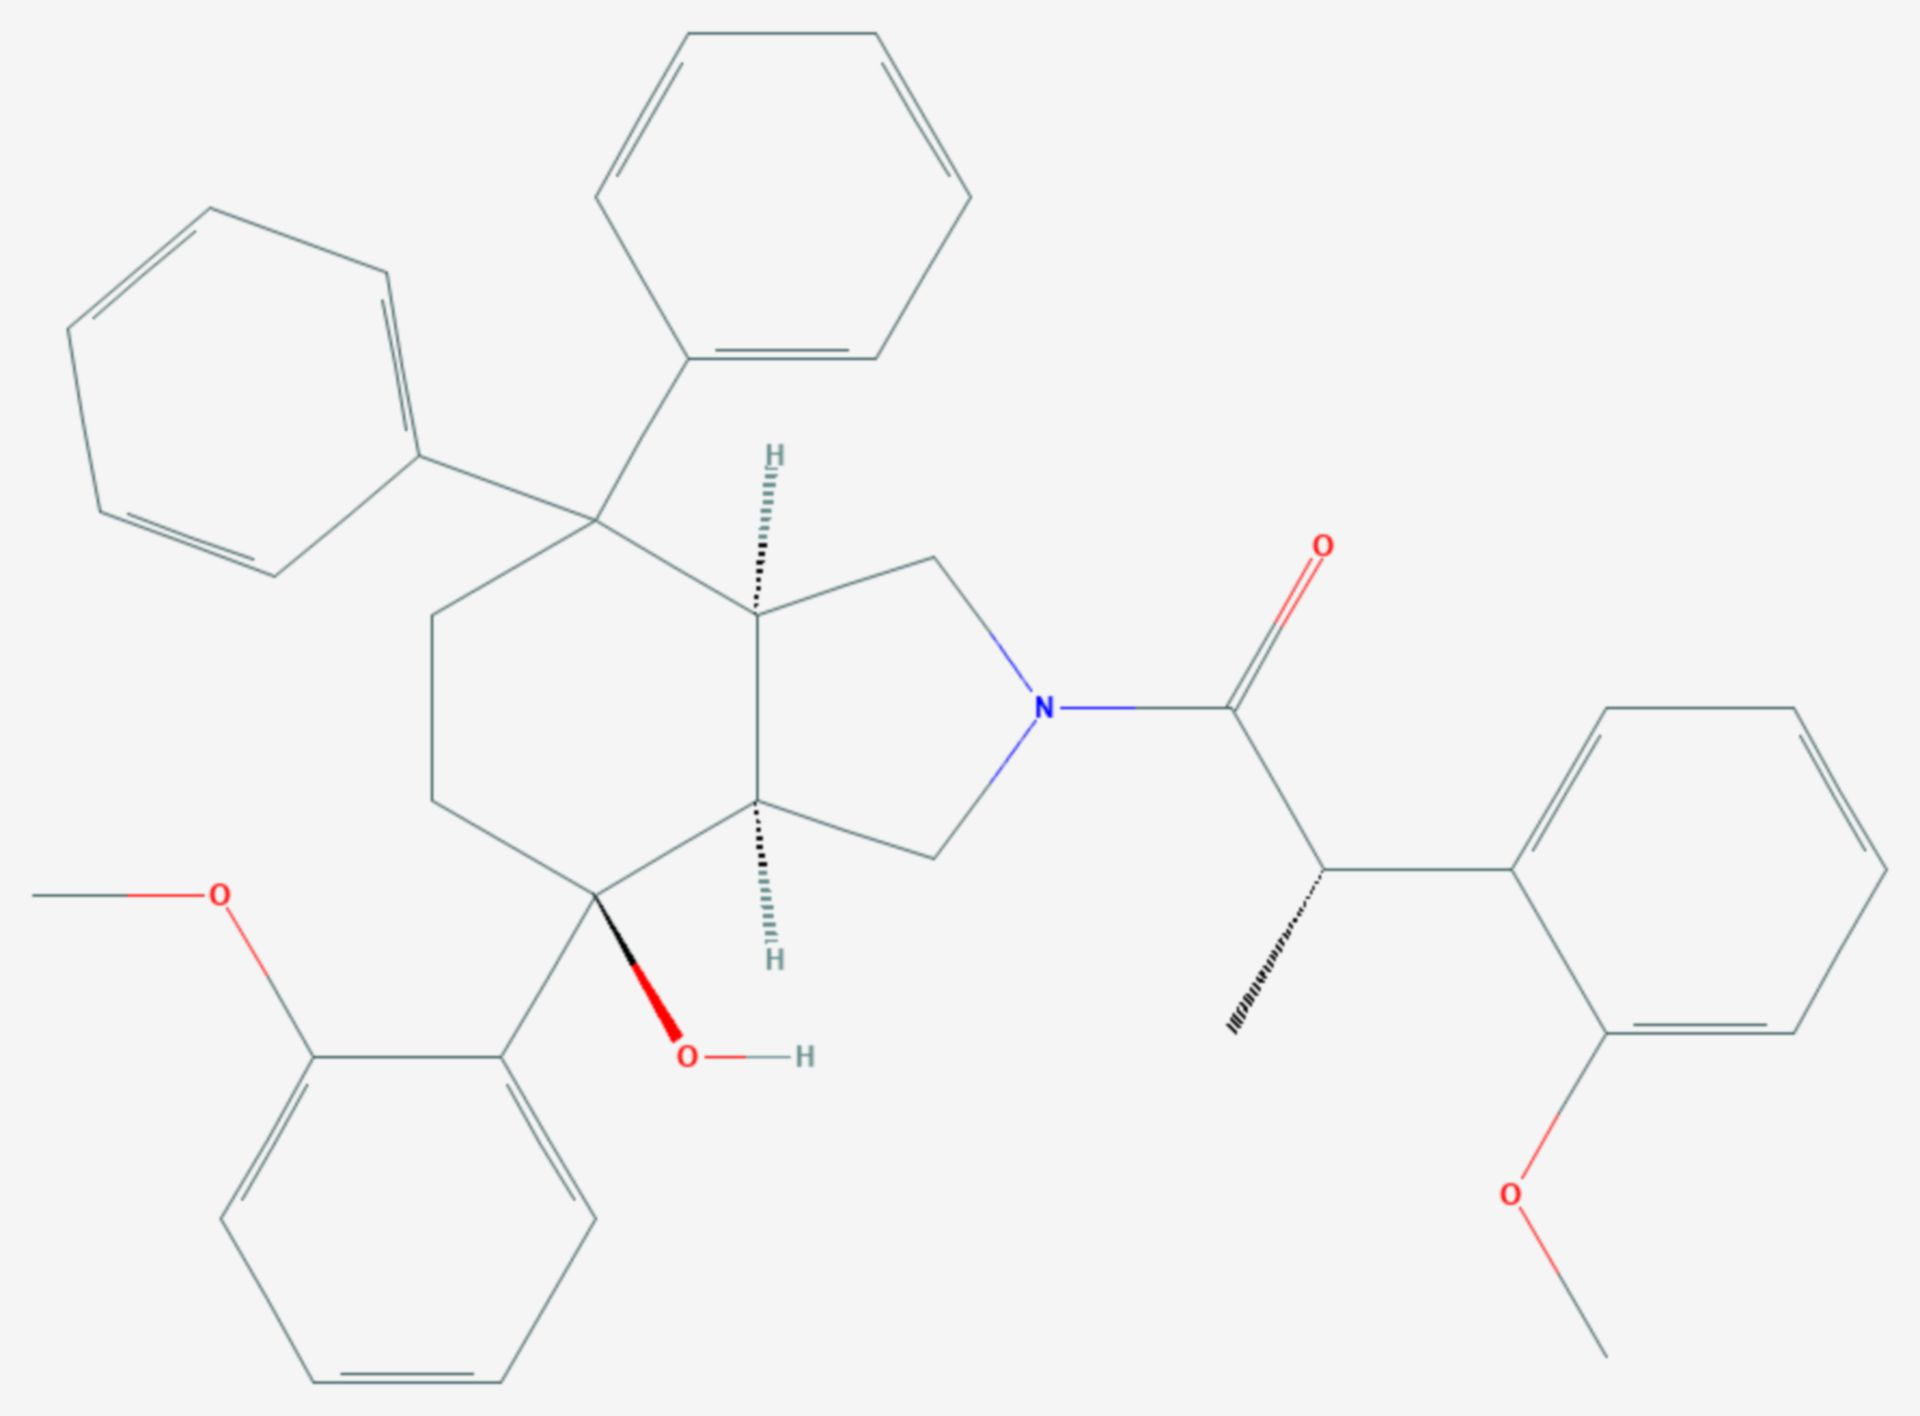 Dapitant (Strukturformel)